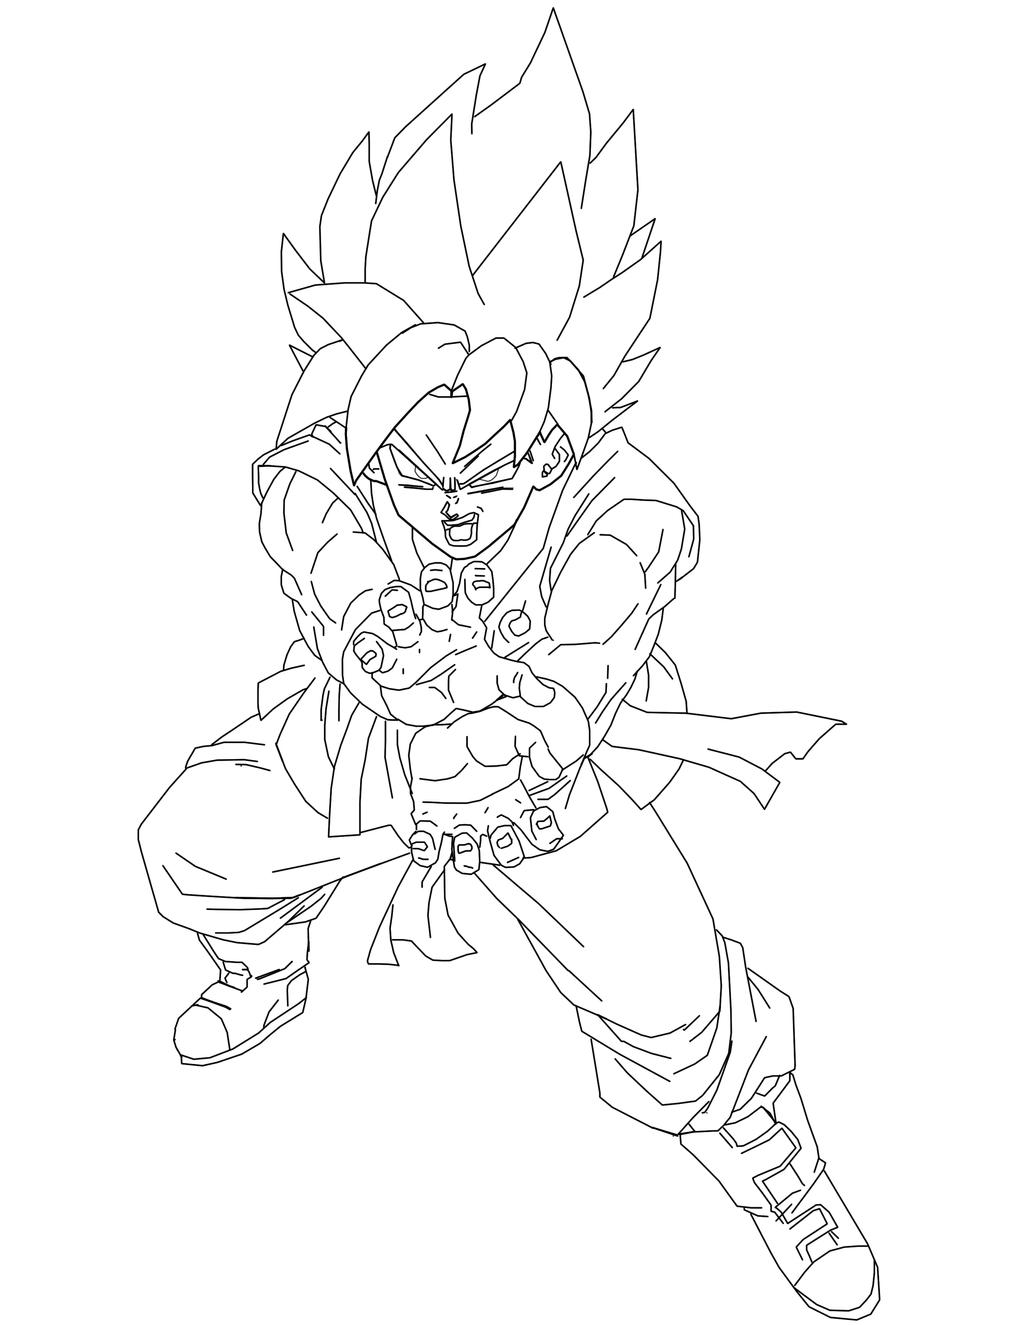 Super Saiyan Blue Goku lineart by BrusselTheSaiyan on ...